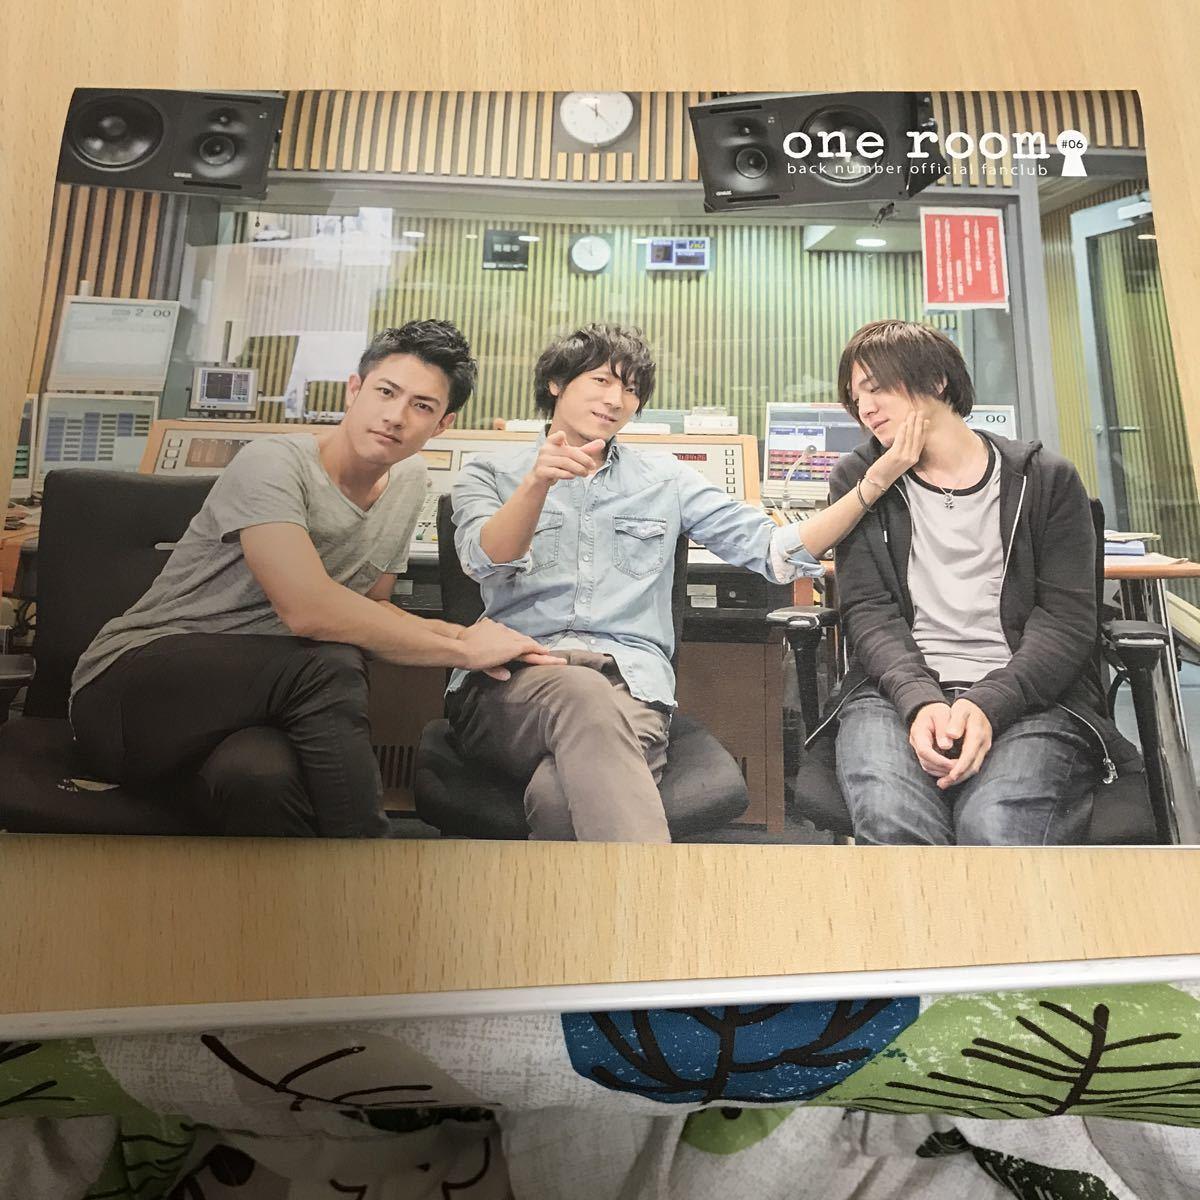 ☆used☆back number ファンクラブ限定 oneroom 会報誌 vol.6